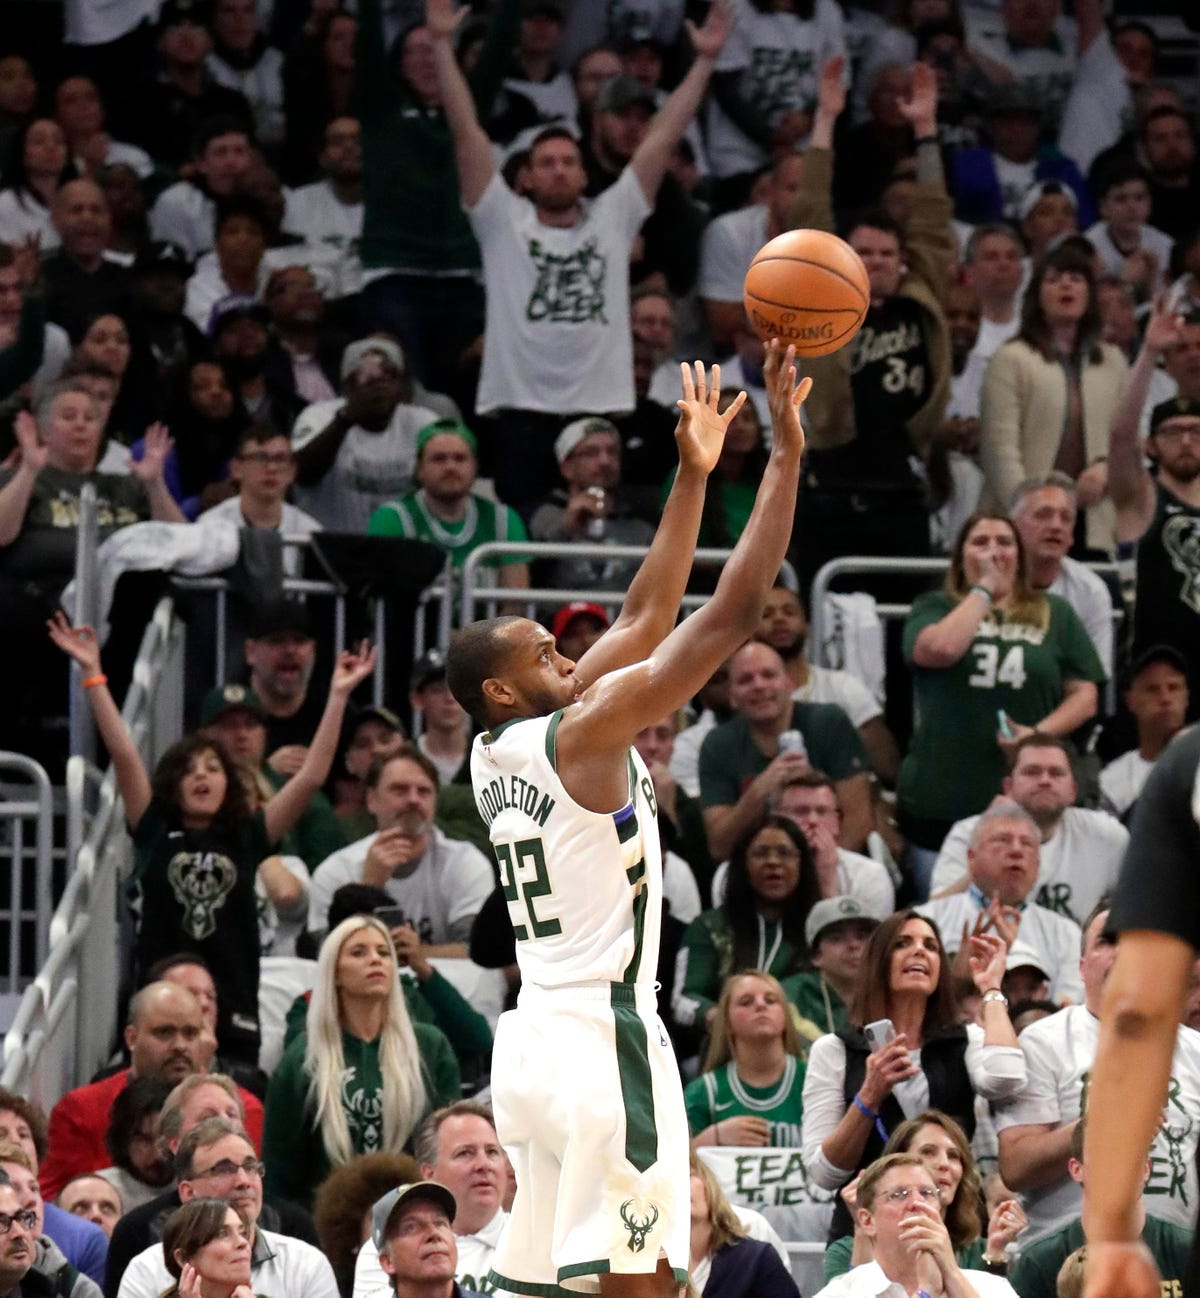 NBA playoffs: Bucks rout Celtics in Game 2 to tie series 1-1